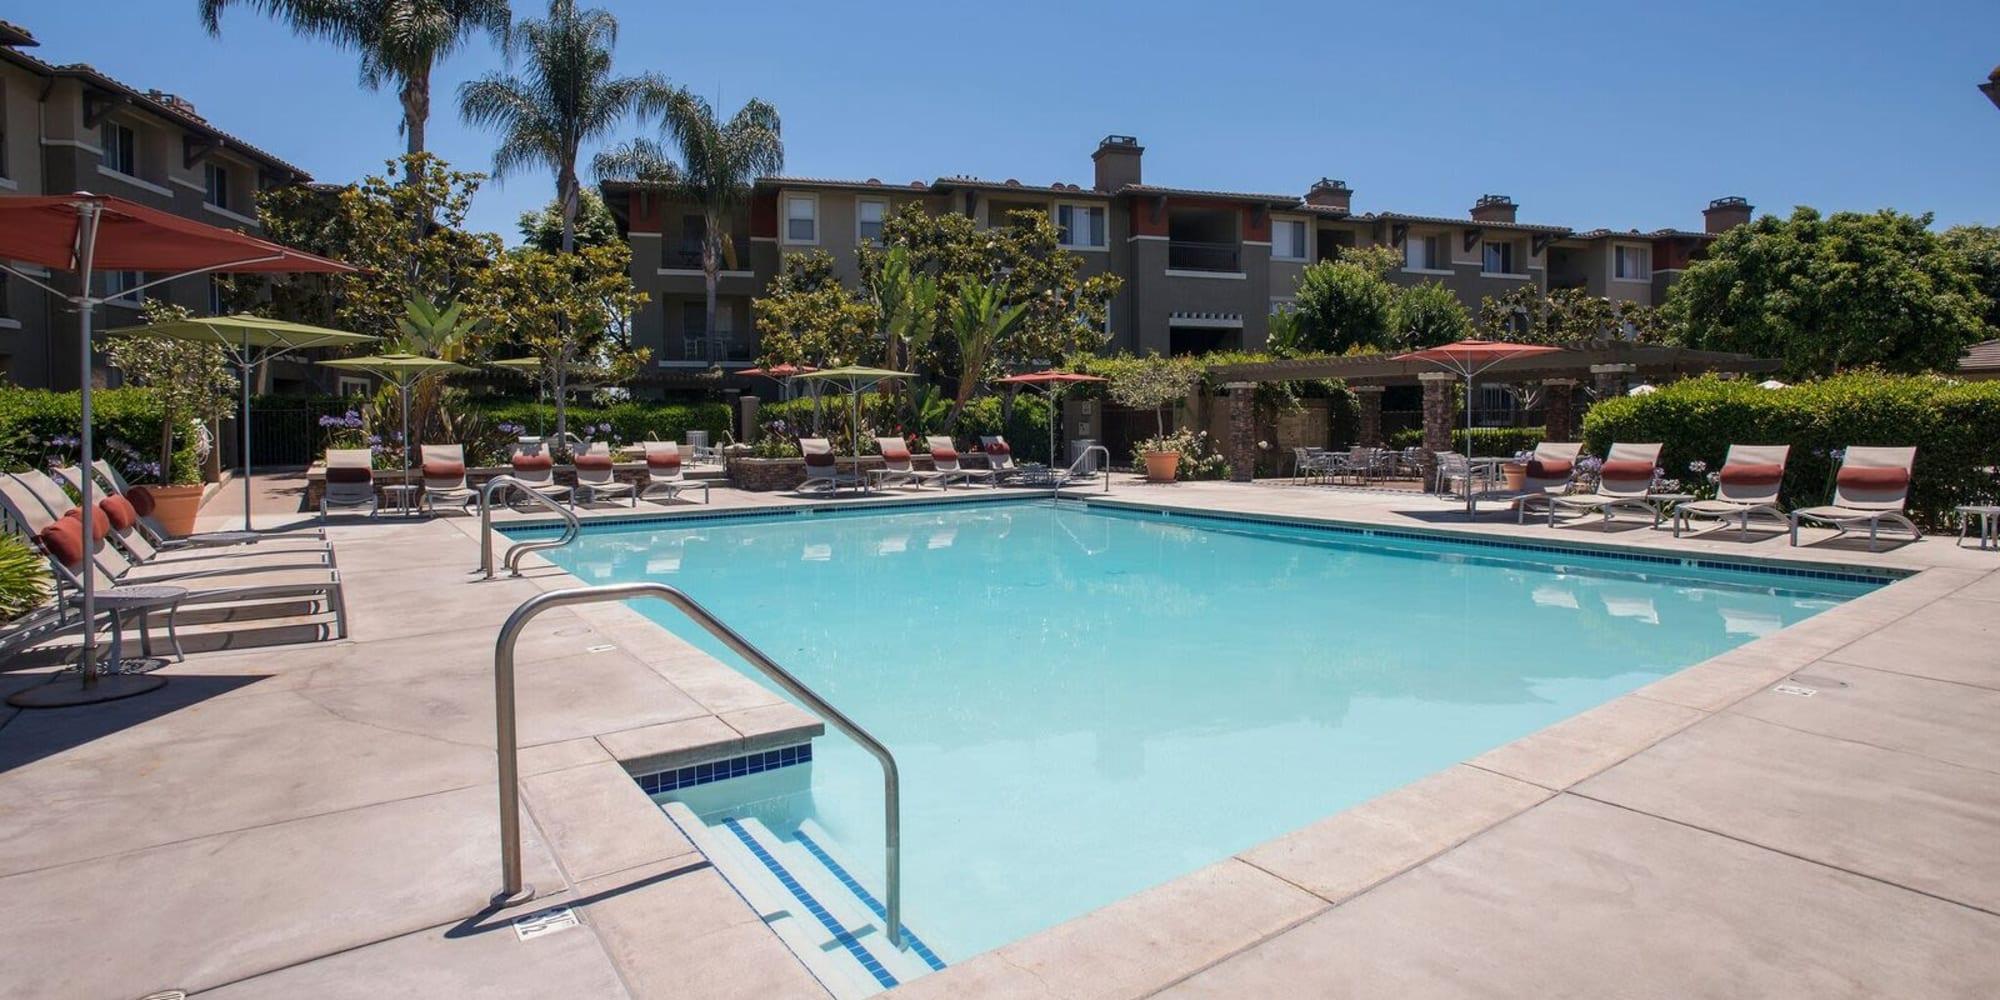 Apartments at Alicante Apartment Homes in Aliso Viejo, California